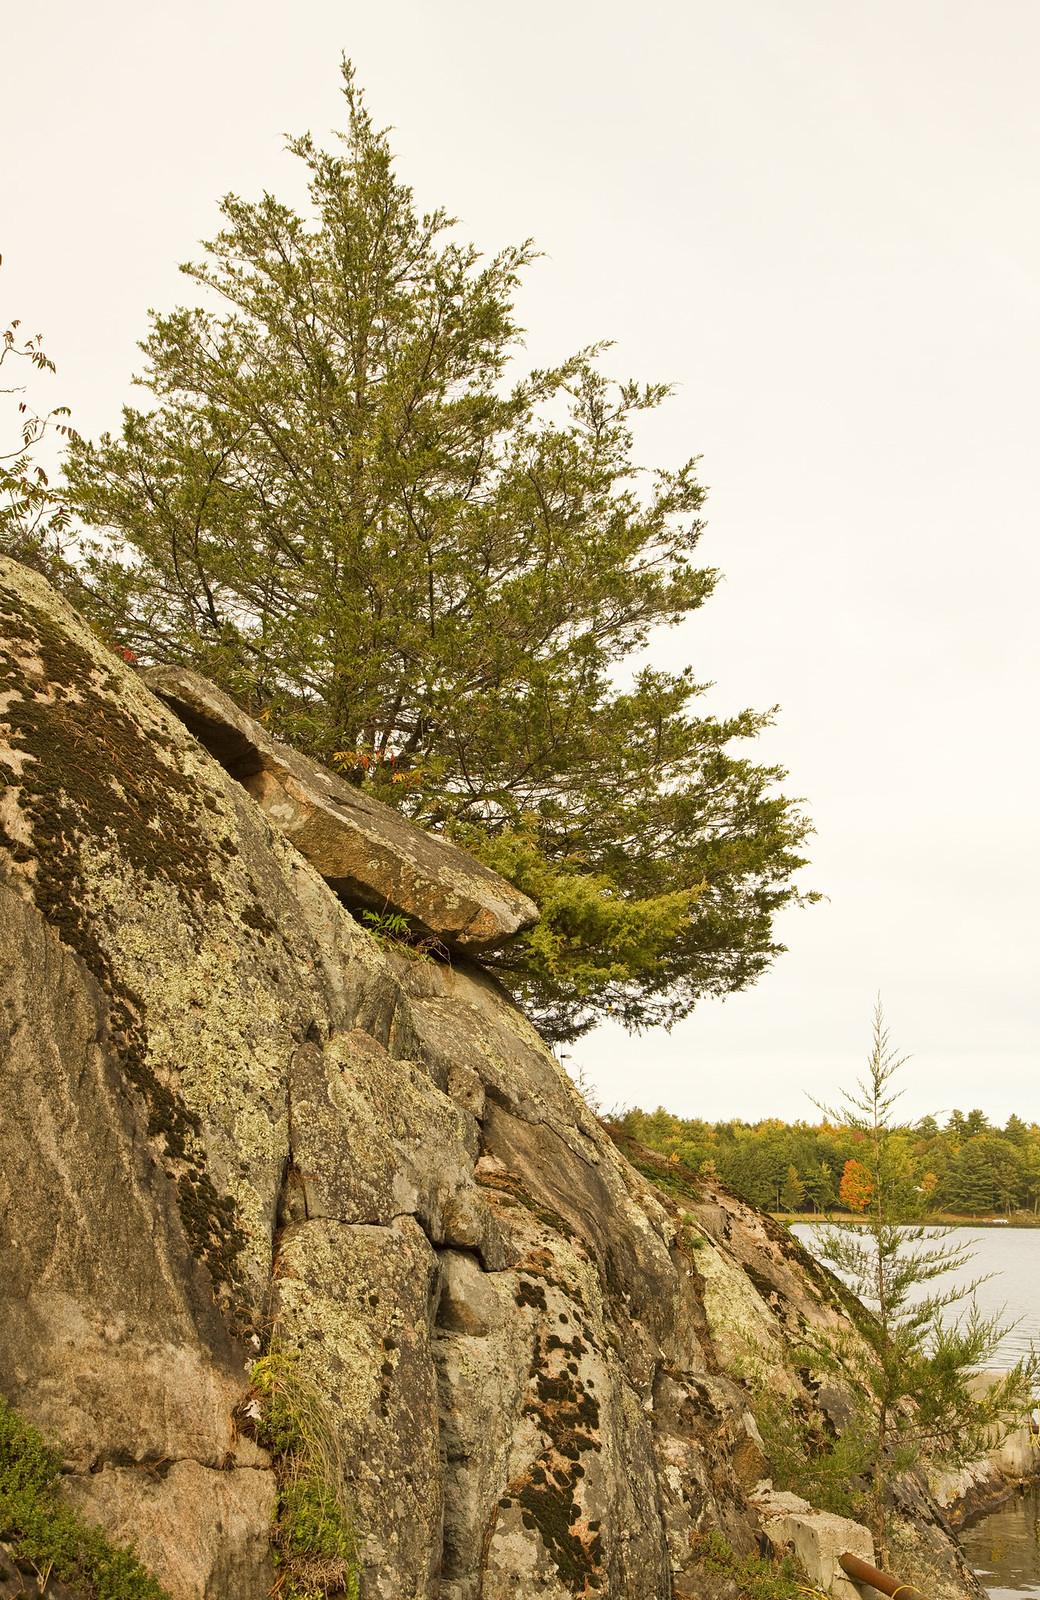 burleigh falls rocky tree